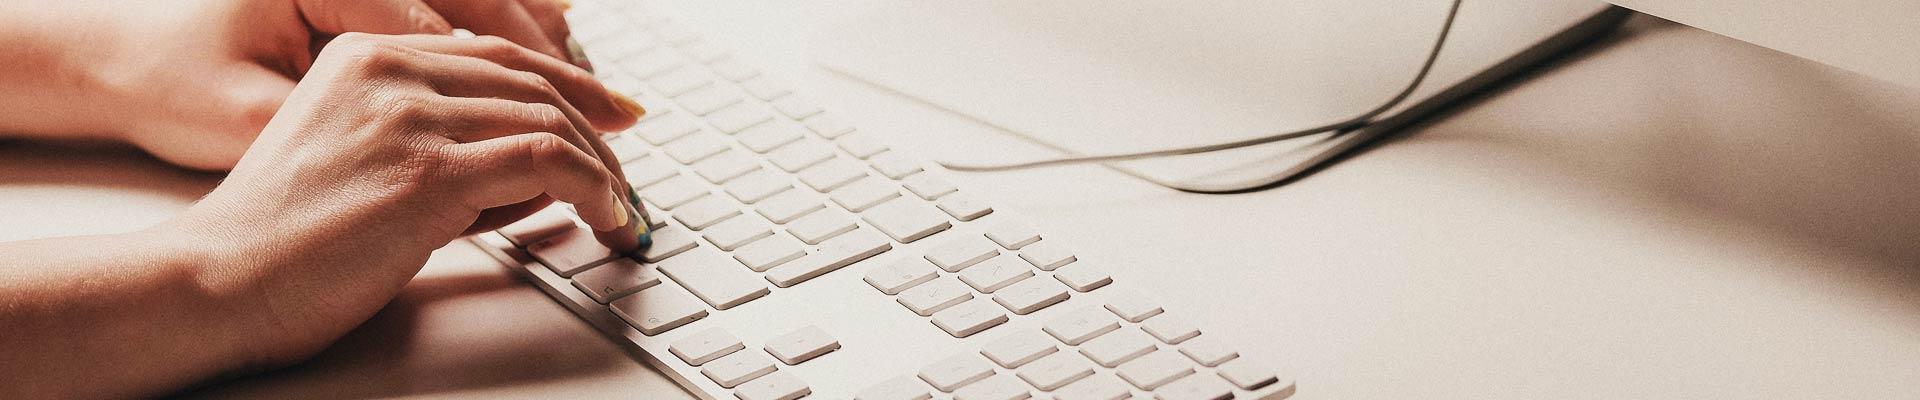 tastiera-mac-scrivere-unitechlab-1.jpg